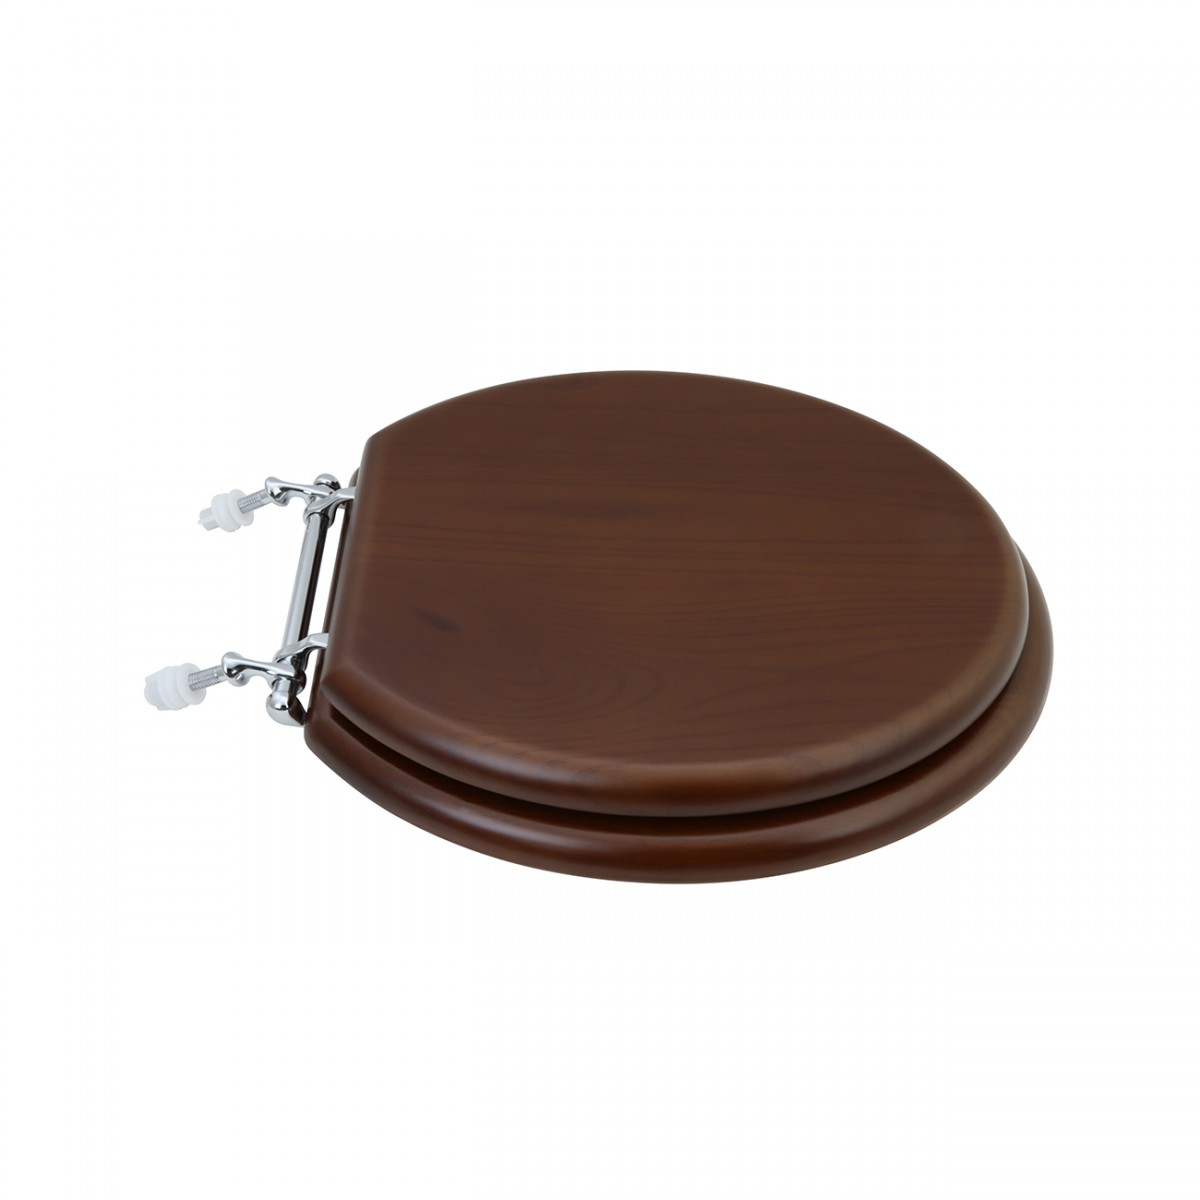 Toilet Seat Round Solid Wood Dark Oak Chrome Hinge wood toilet seats toilet seat covers Round Toilet Seat